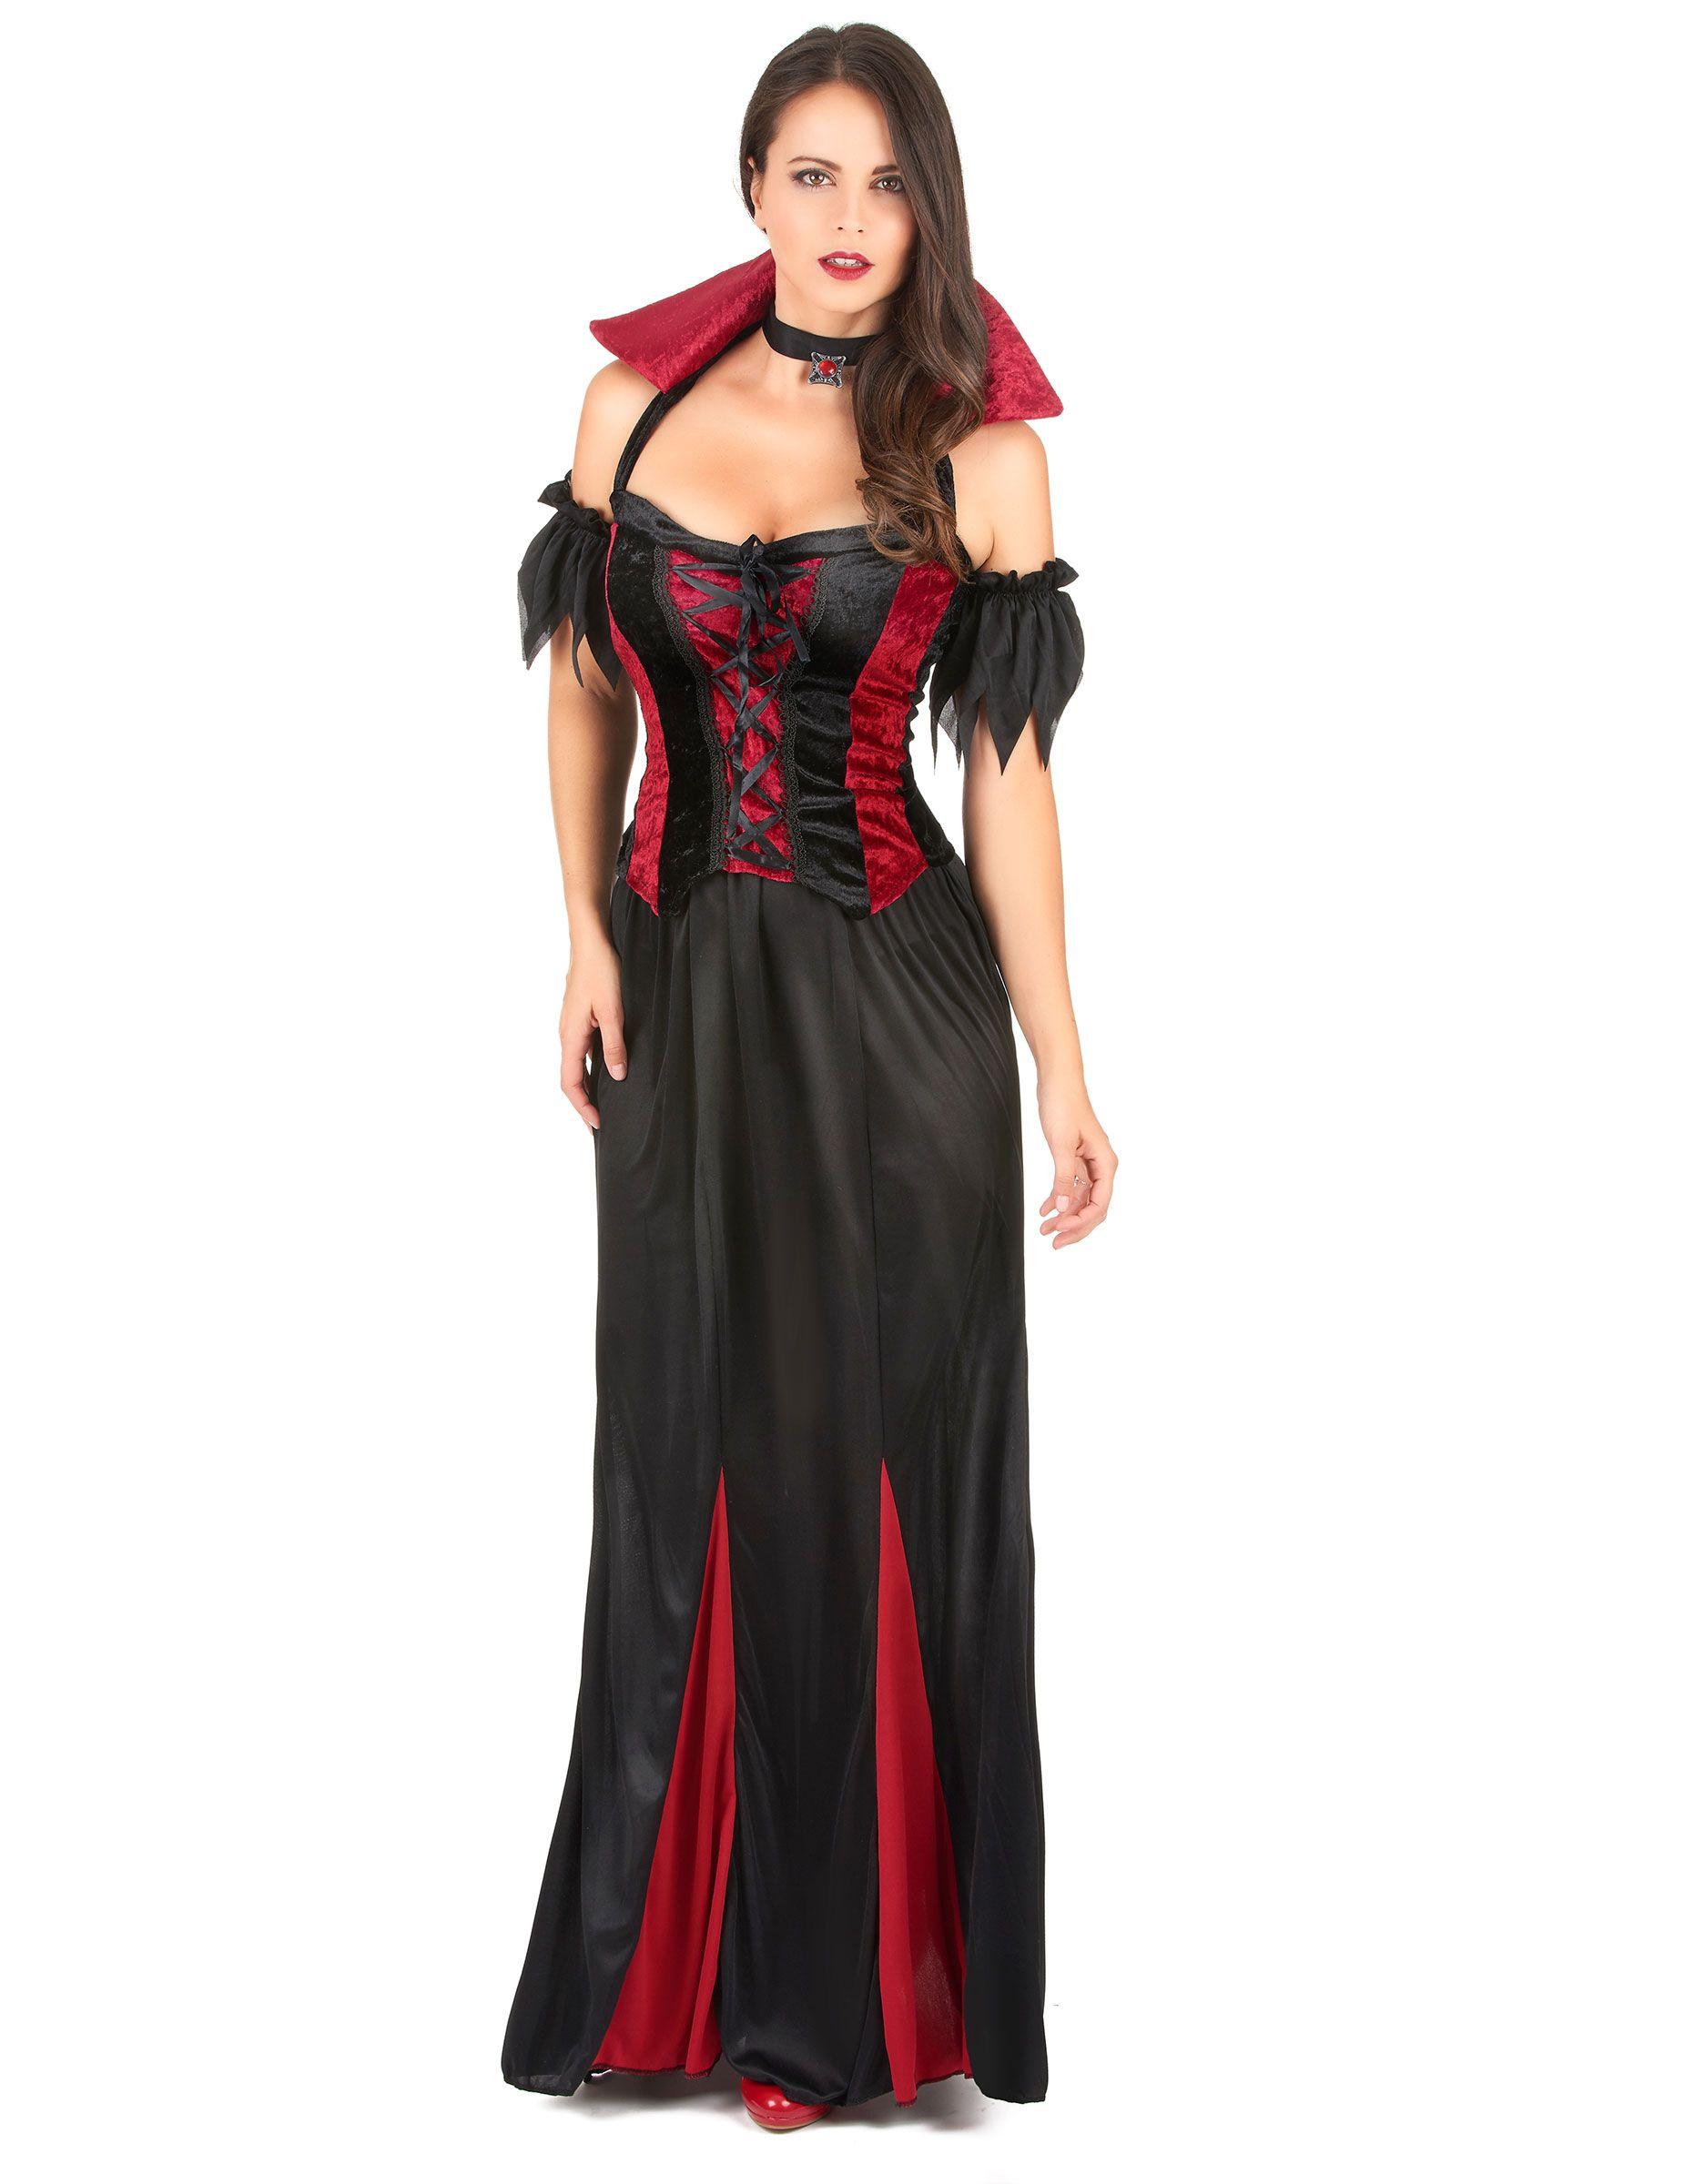 Halloween vampire costume for women (con imágenes) Traje